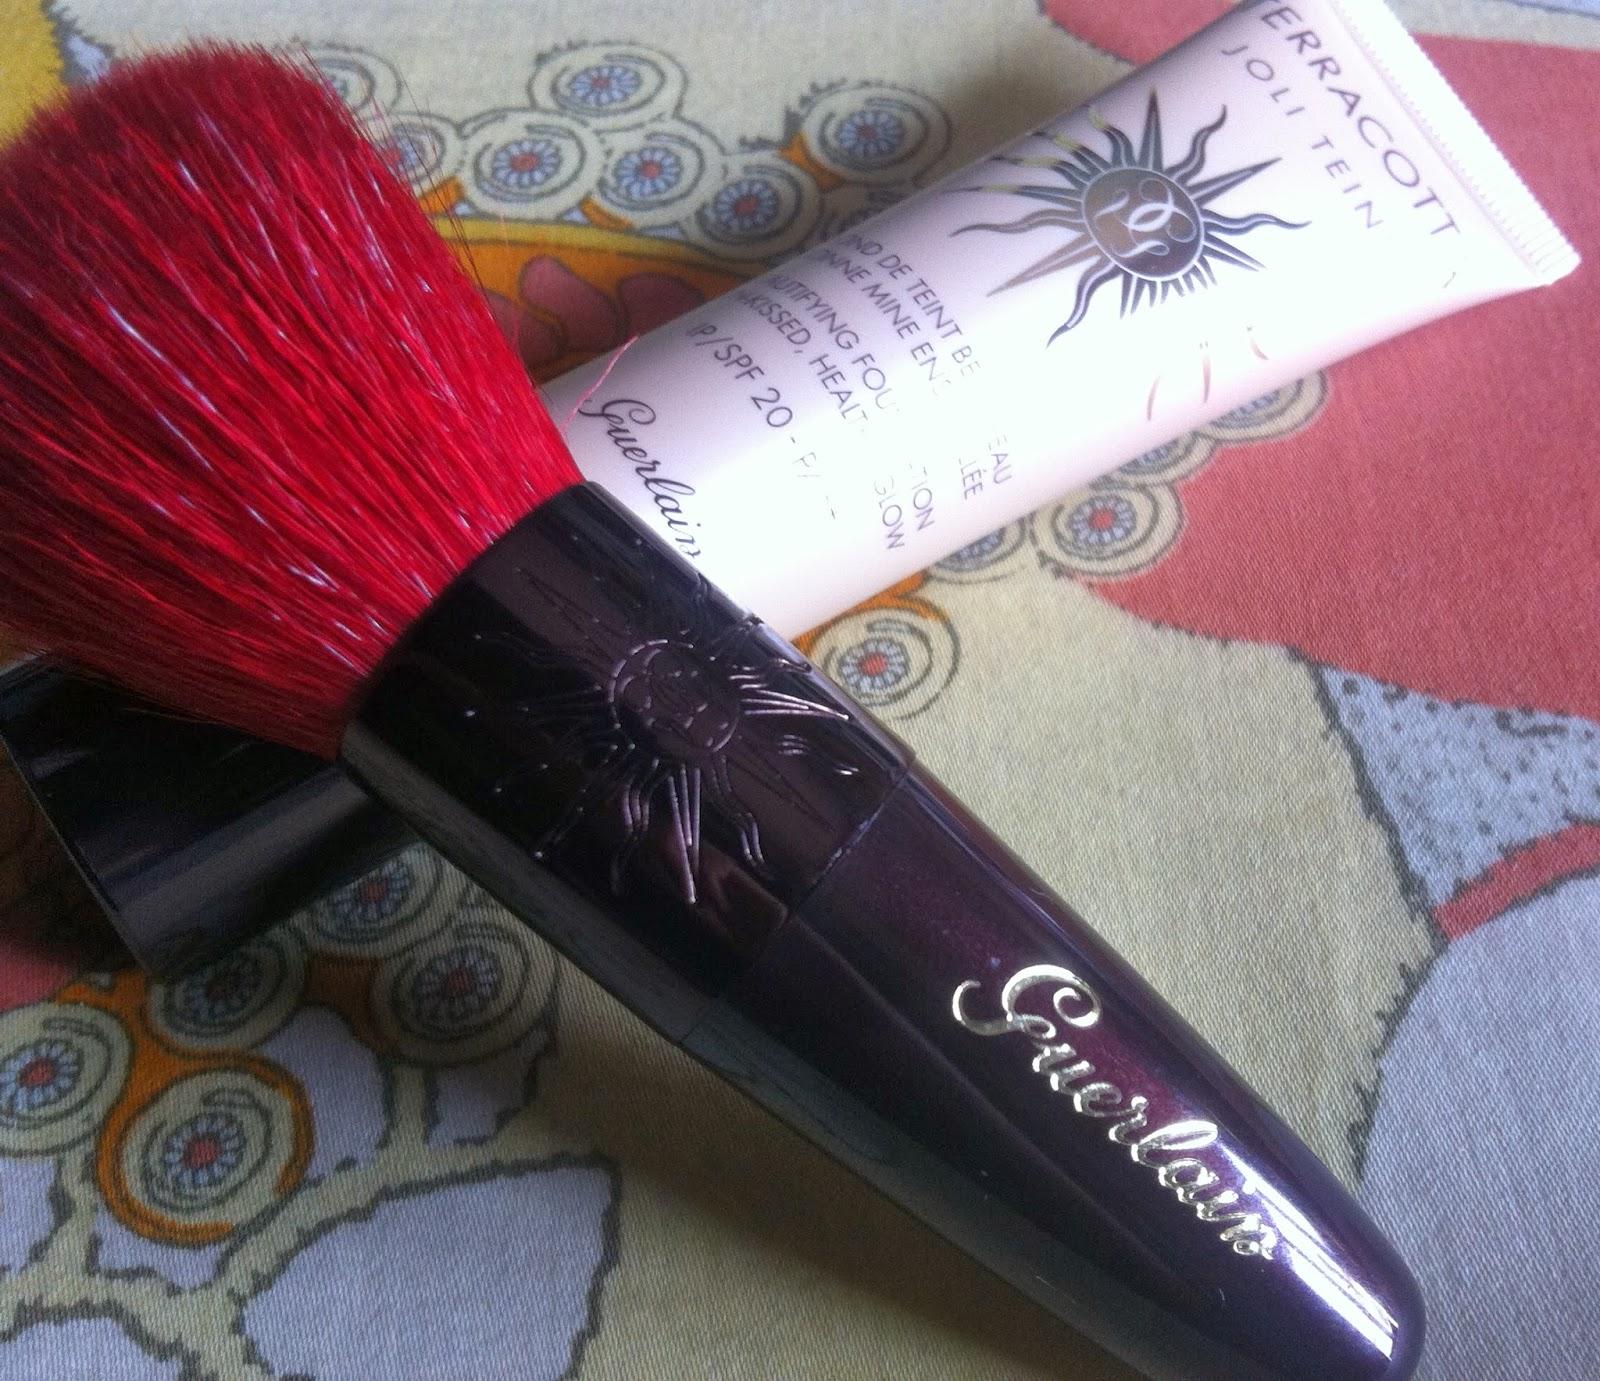 Guerlain Terracotta 2014 Joli Teint make up fondotinta